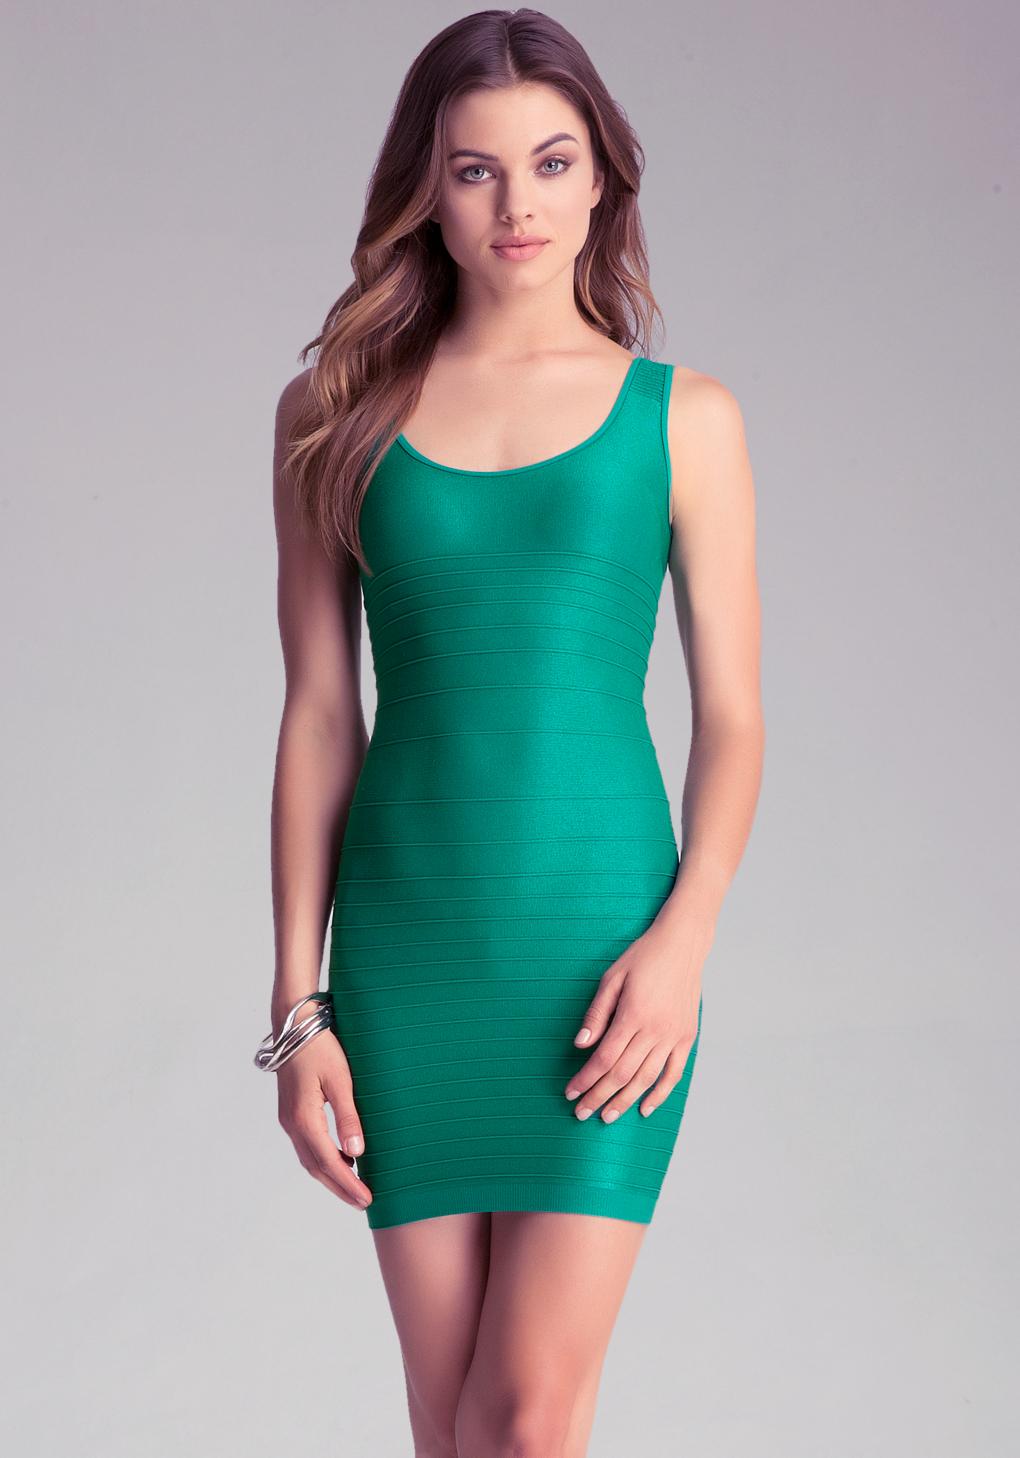 Lyst Bebe Back Cut Out Shine Dress In Green